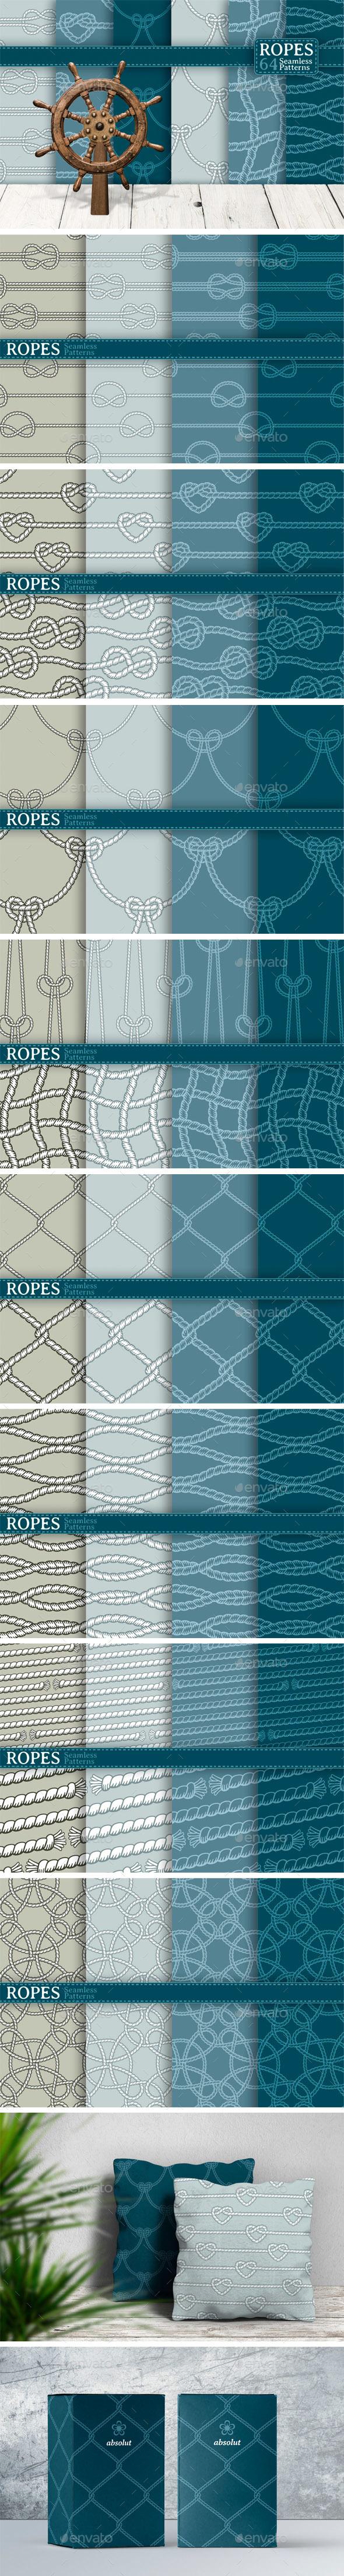 Ropes 64 Seamless Patterns - Patterns Decorative